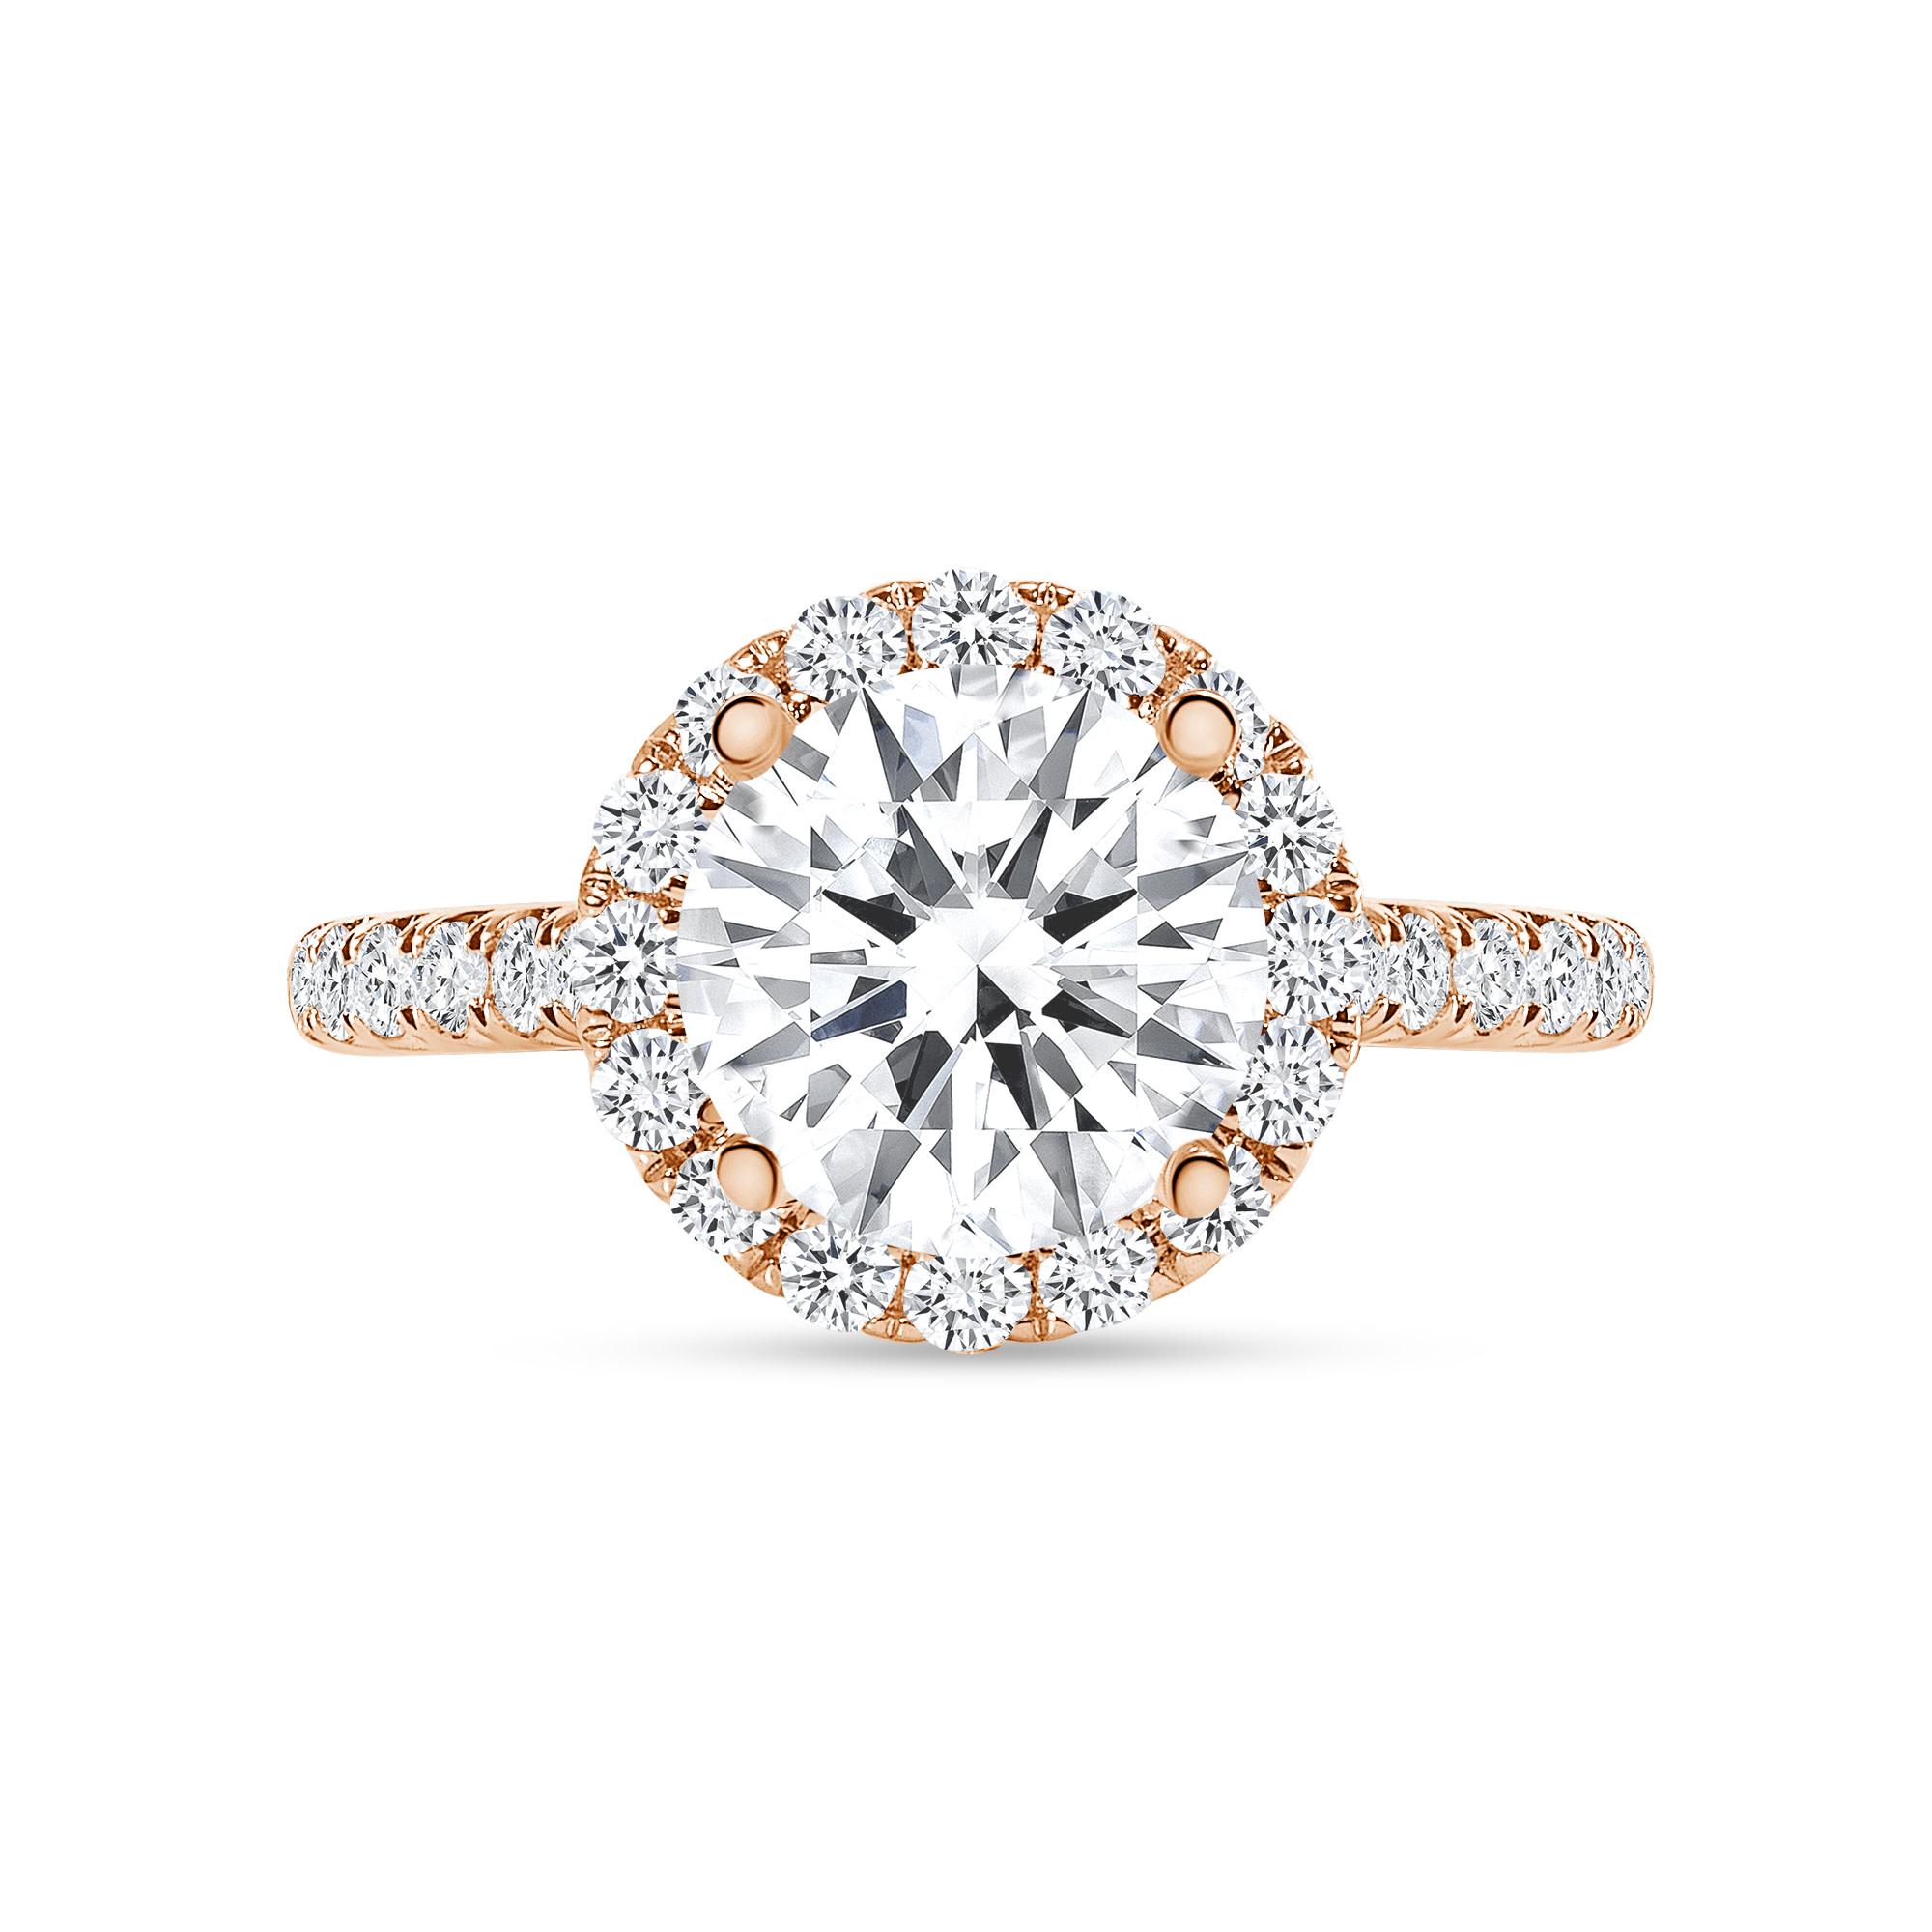 1.5 carat round diamond engagement ring